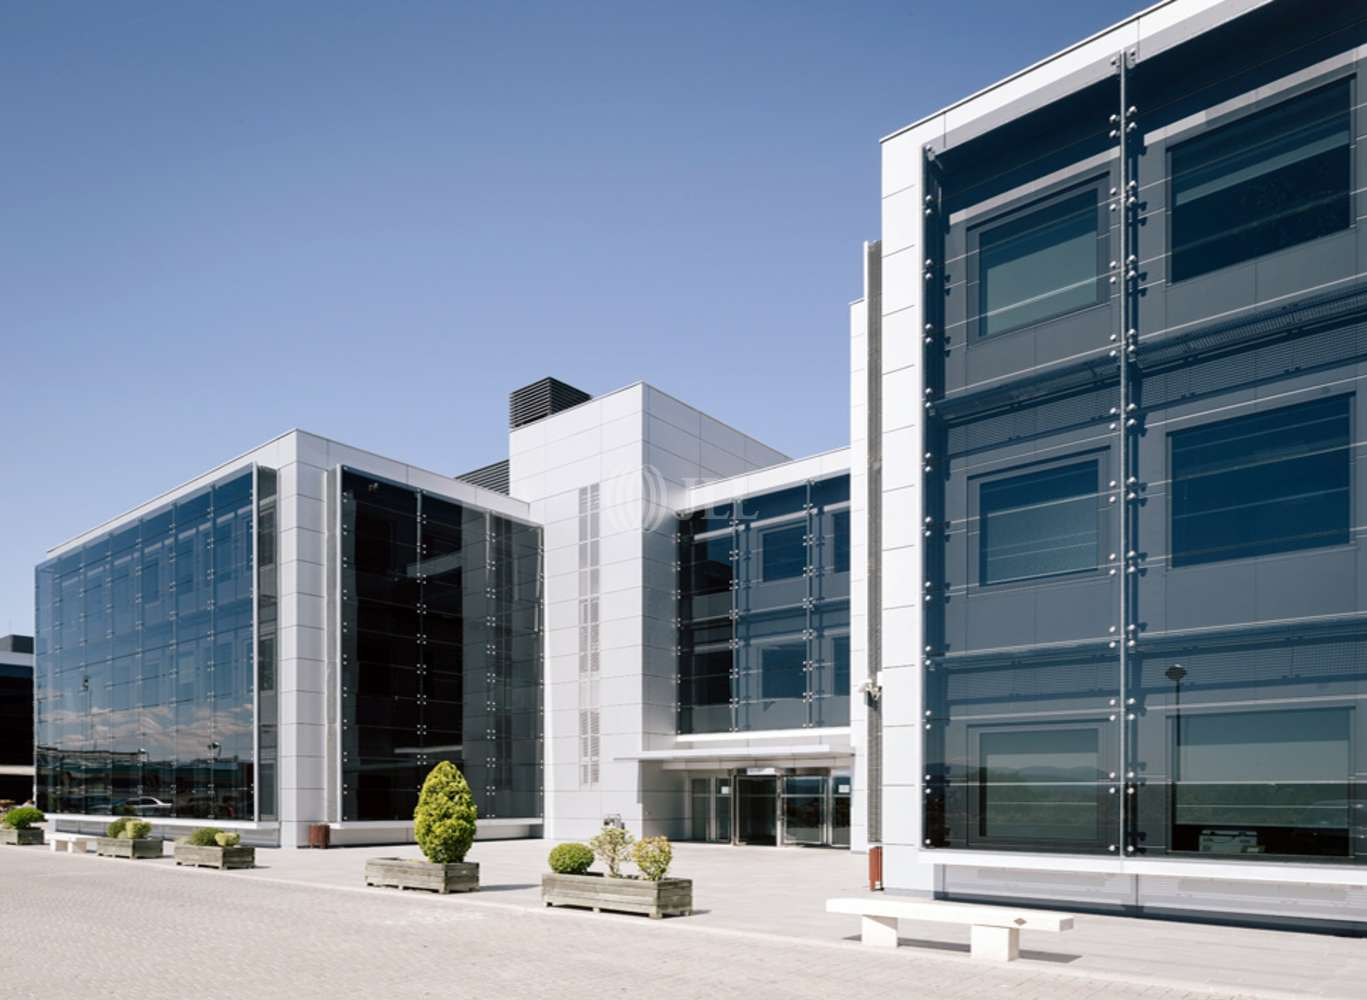 Oficina Las rozas de madrid, 28232 - Edificio 3. P.E. Alvia - 5791